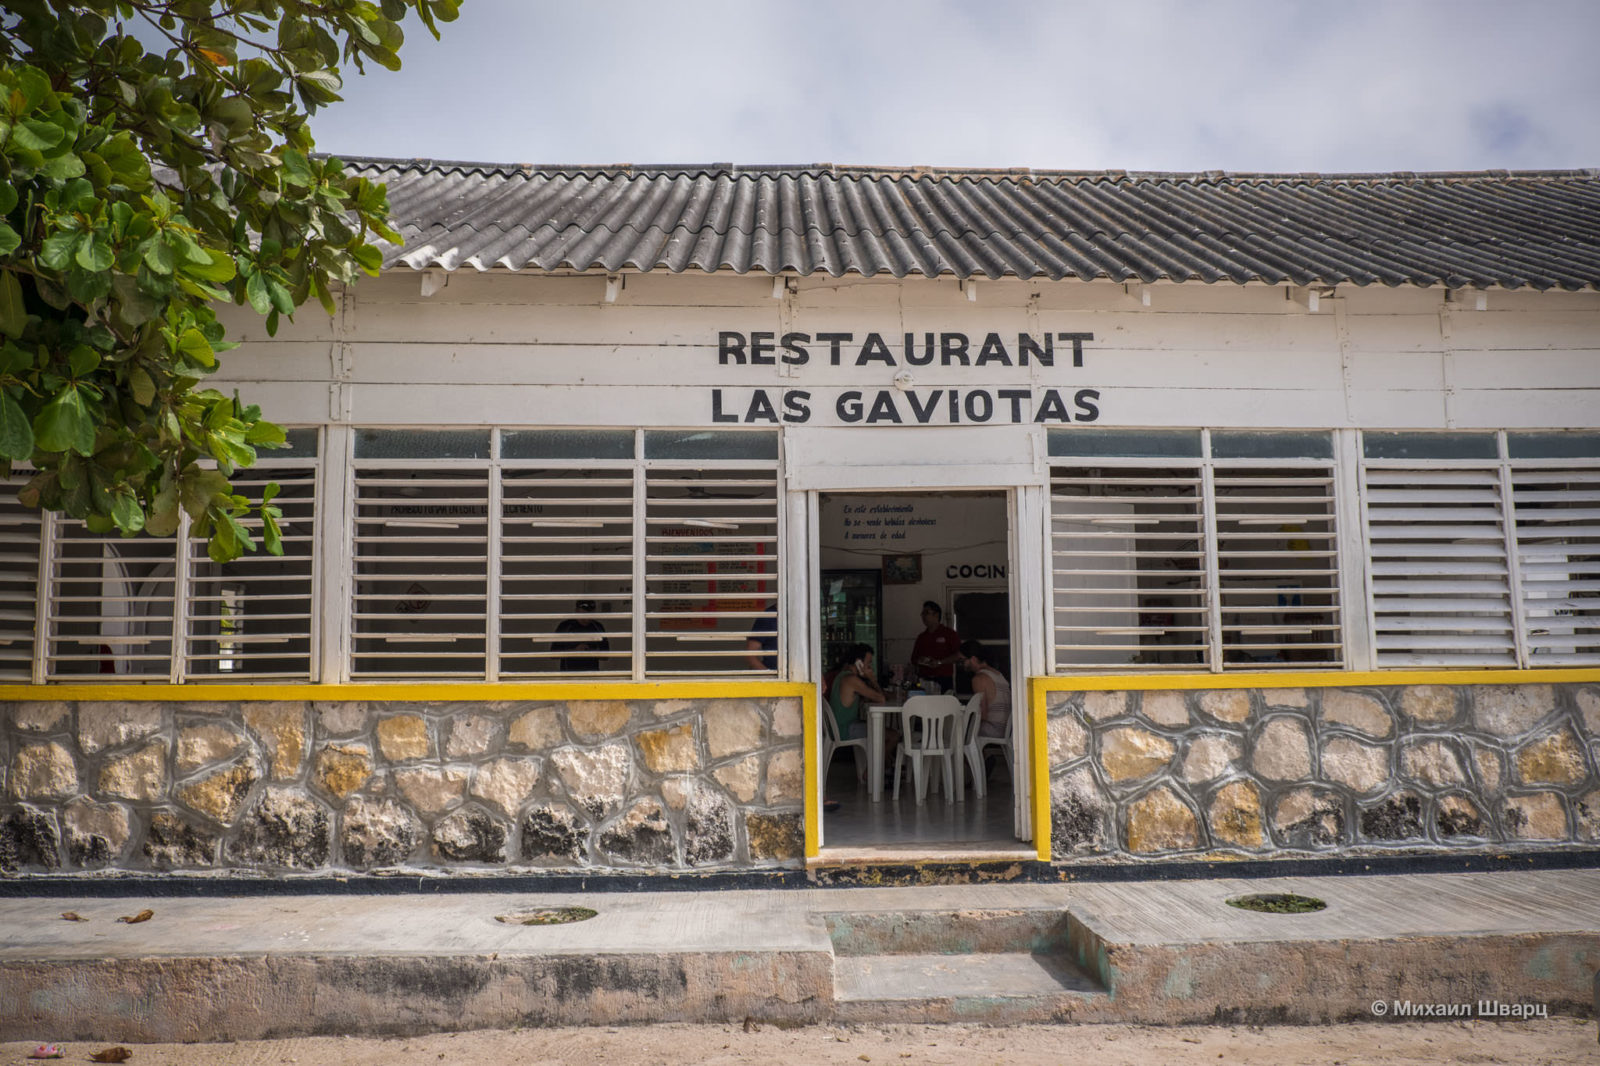 Restaurant Las Gaviotas